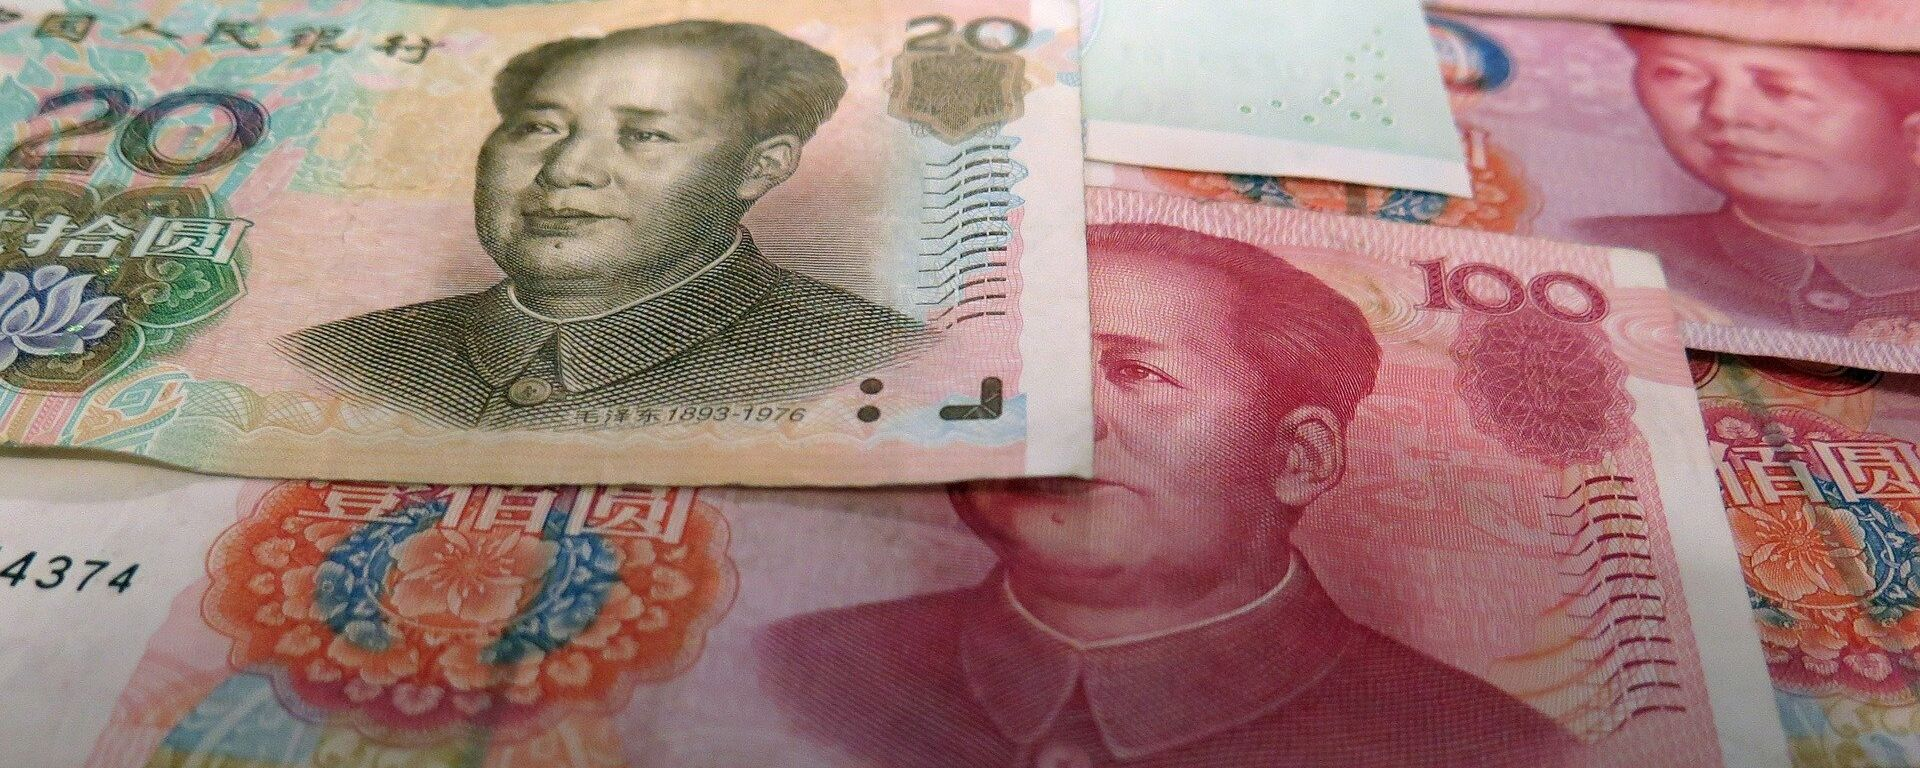 Yuanes chinos (imagen referencial) - Sputnik Mundo, 1920, 01.10.2021